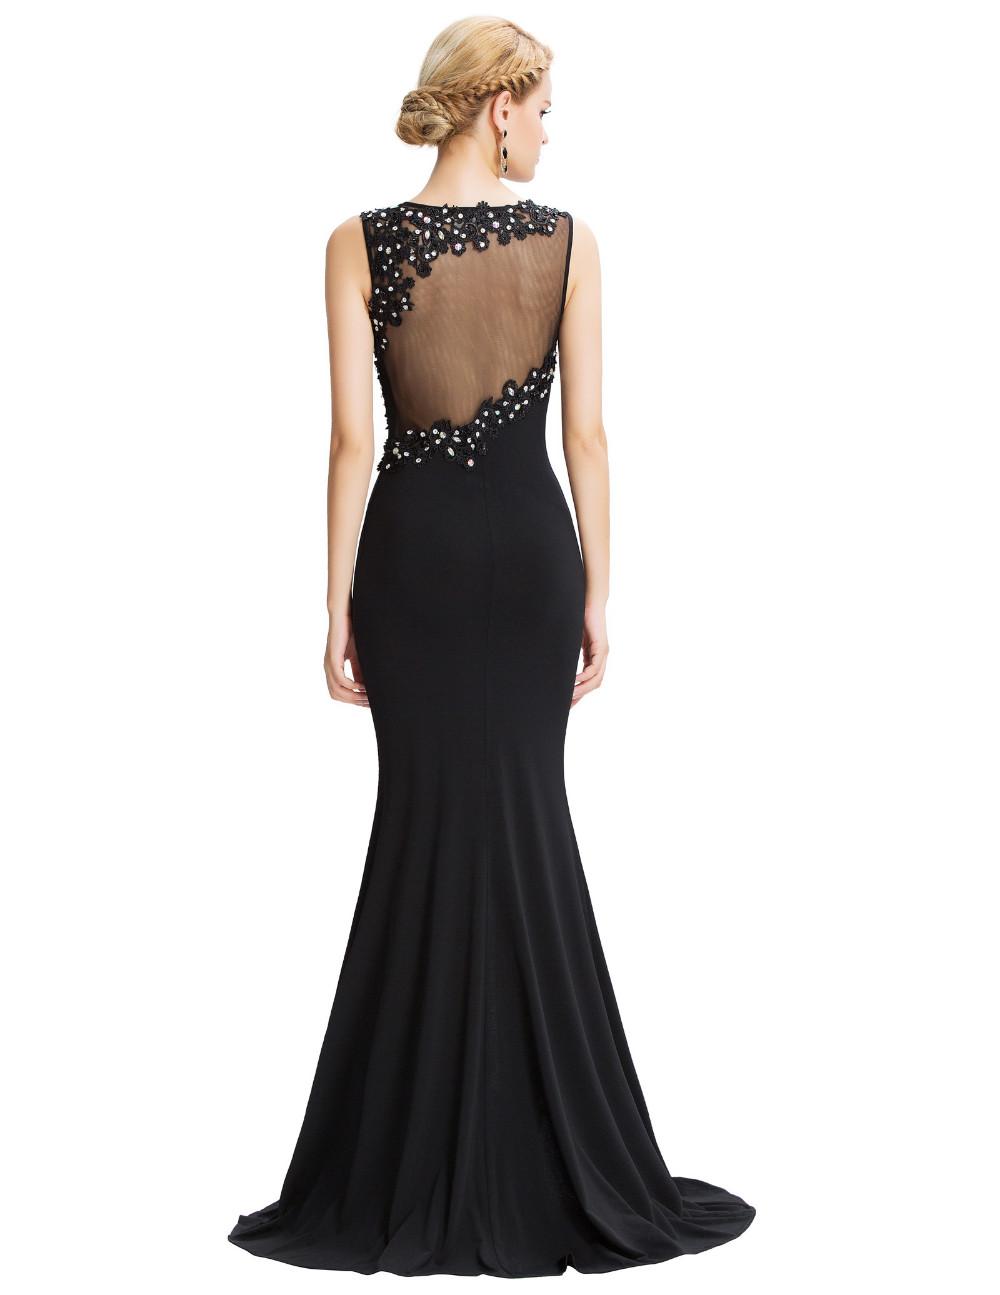 Grace Karin Sleeveless Black Mermaid Evening Dresses Floor Length Elegant Long Formal Dresses Robe De Soiree Sexy Evening Gowns 13